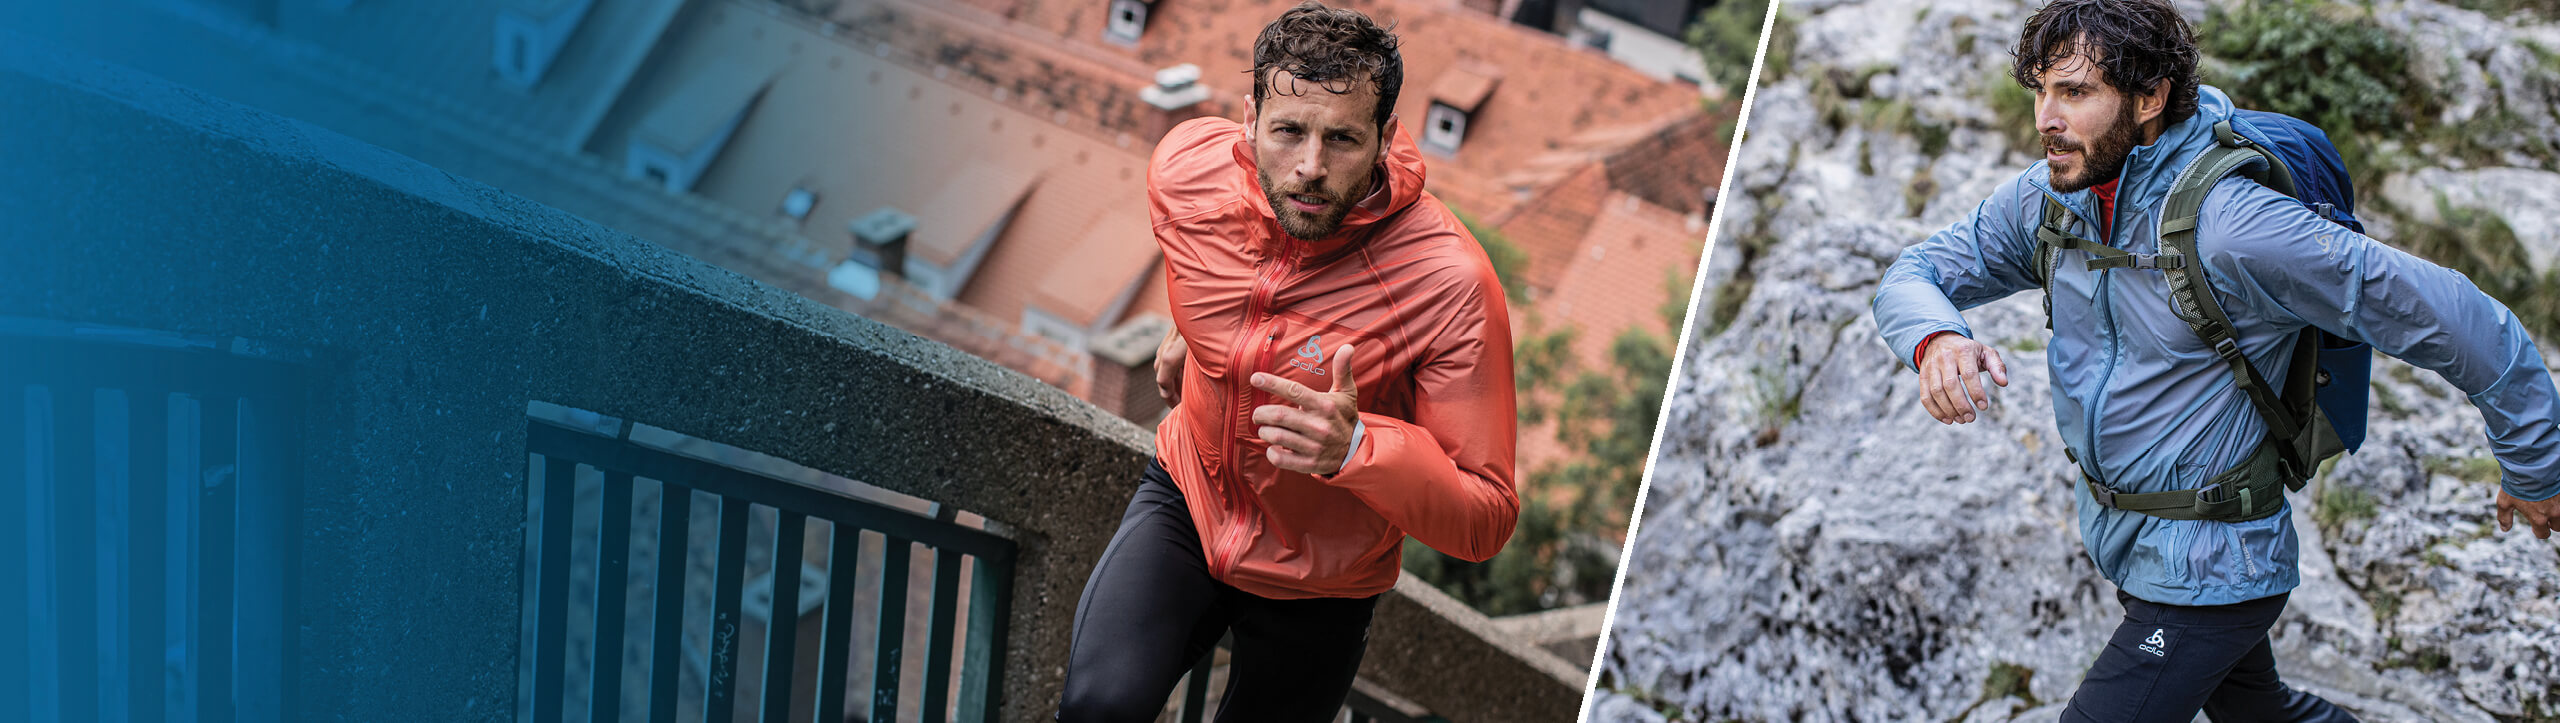 Odlo Men's Sports Underwear - Summer Baselayer